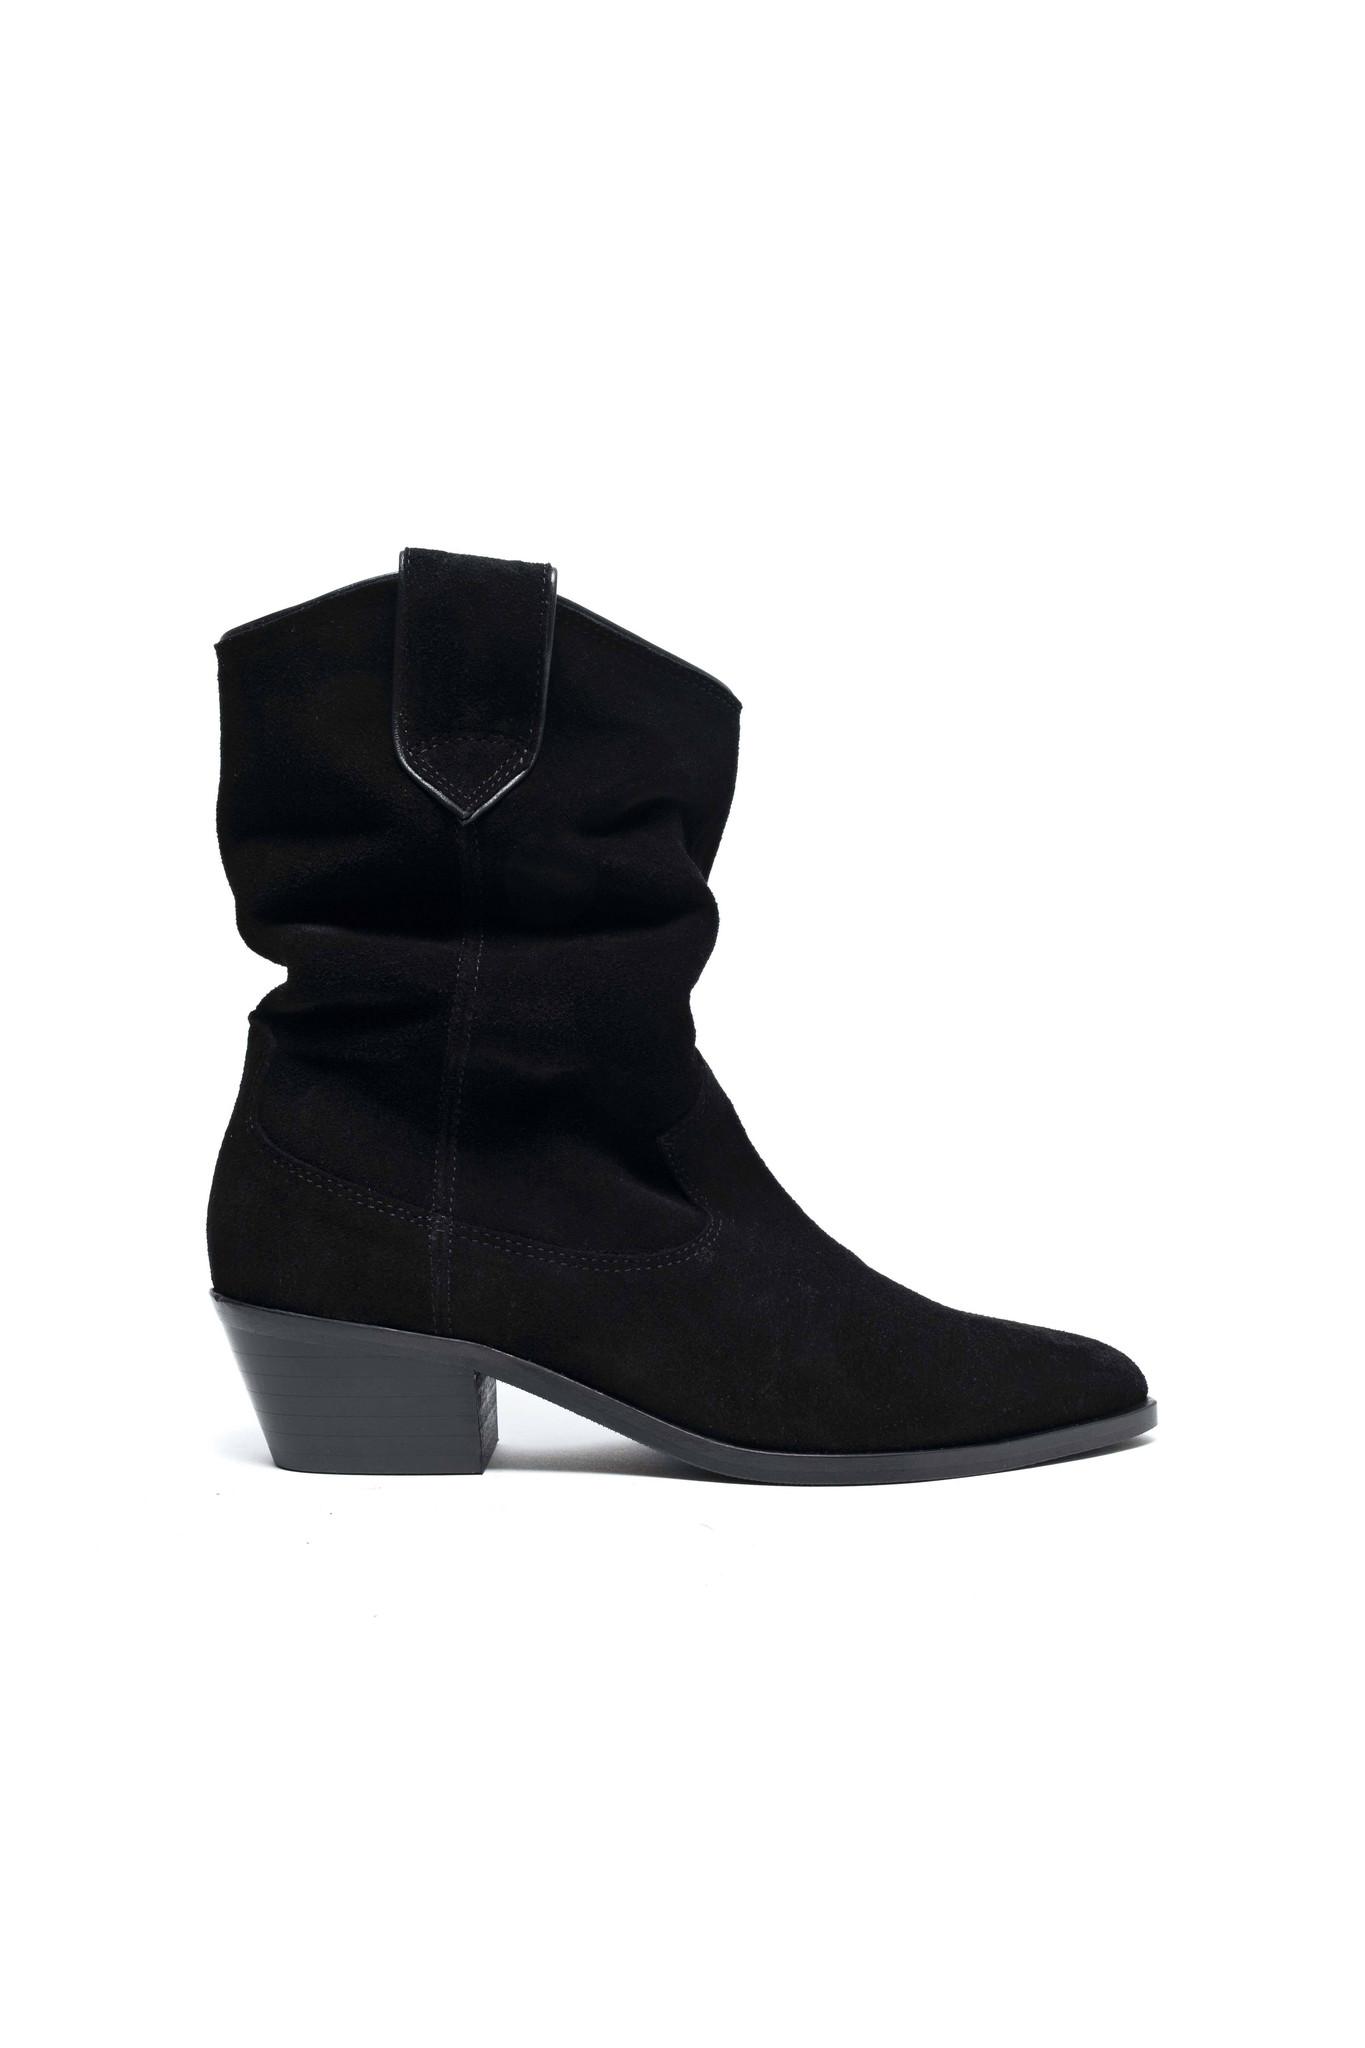 Saseline 35 Calf Suede Boot - Black-1